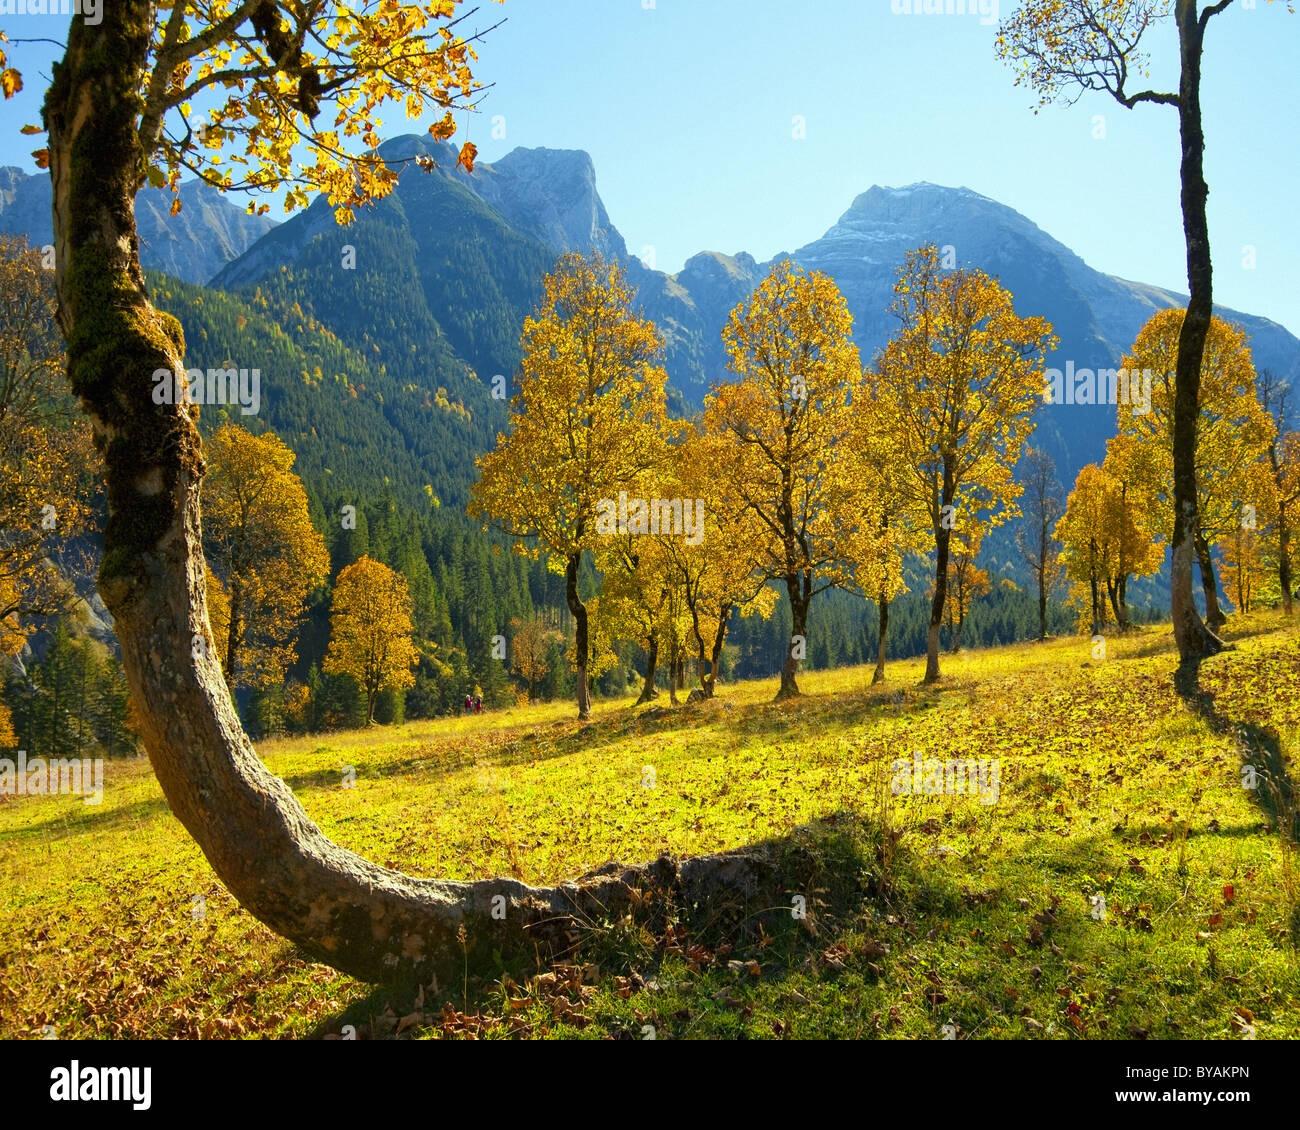 Au Tyrol: Grosser Ahornboden - Photo Stock